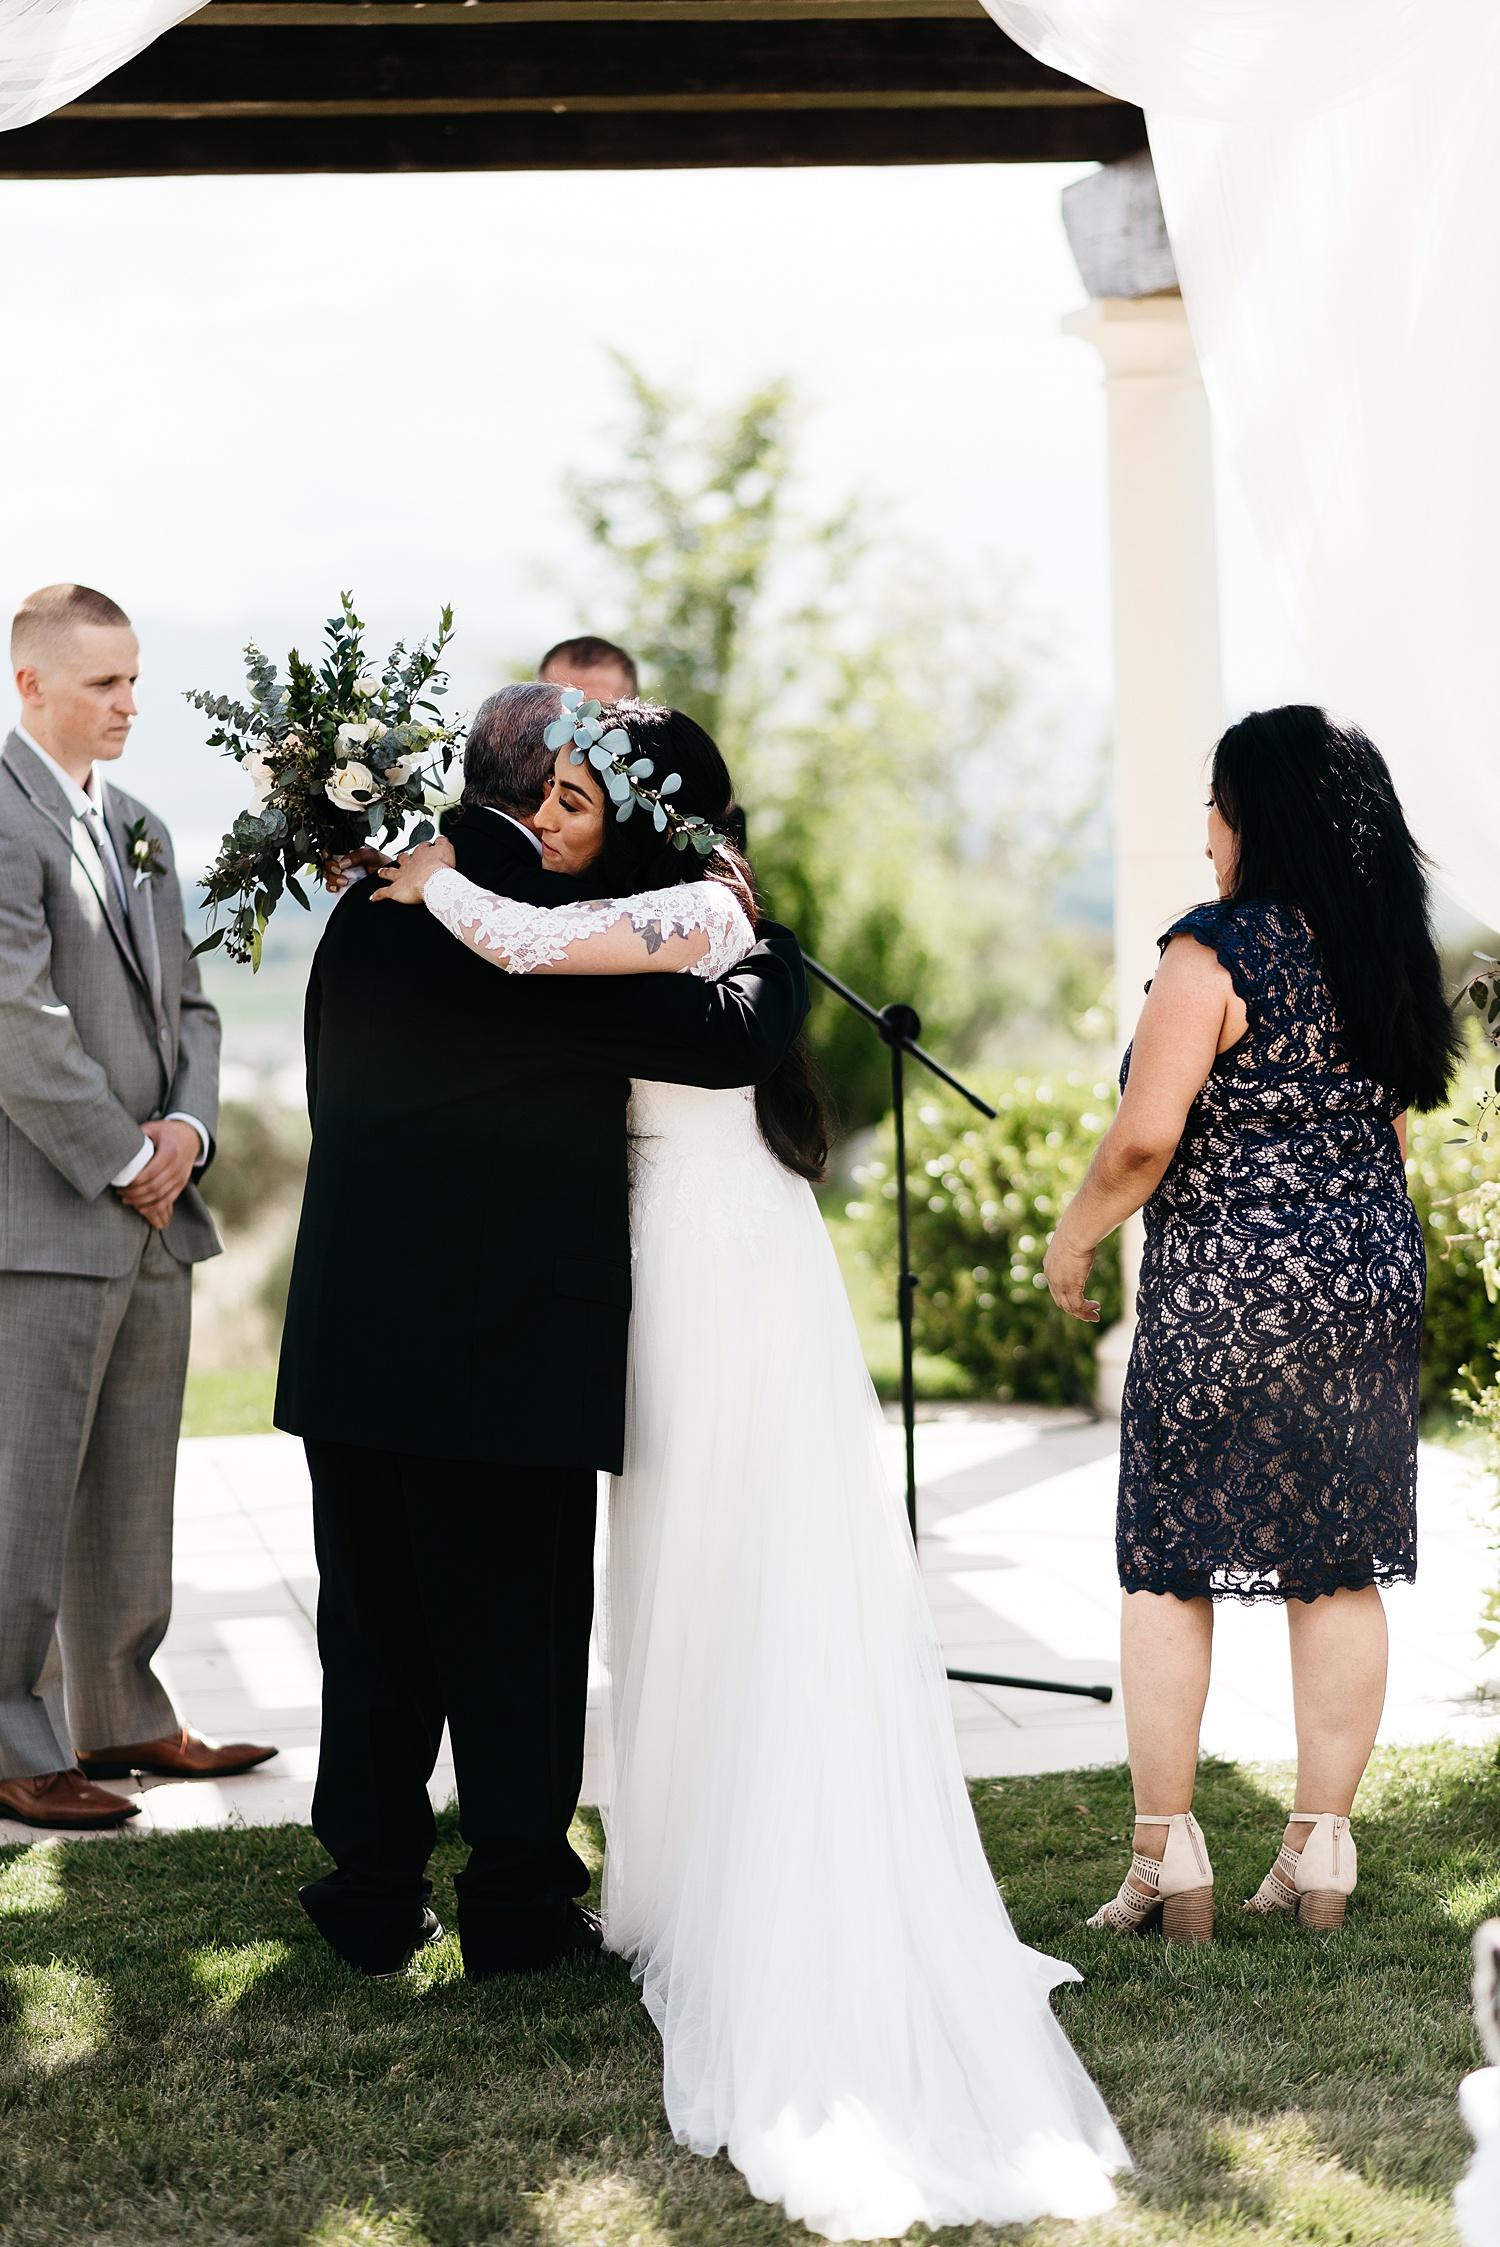 Zandra Barriga Photo - Darian and Colton Wedding_0017.jpg